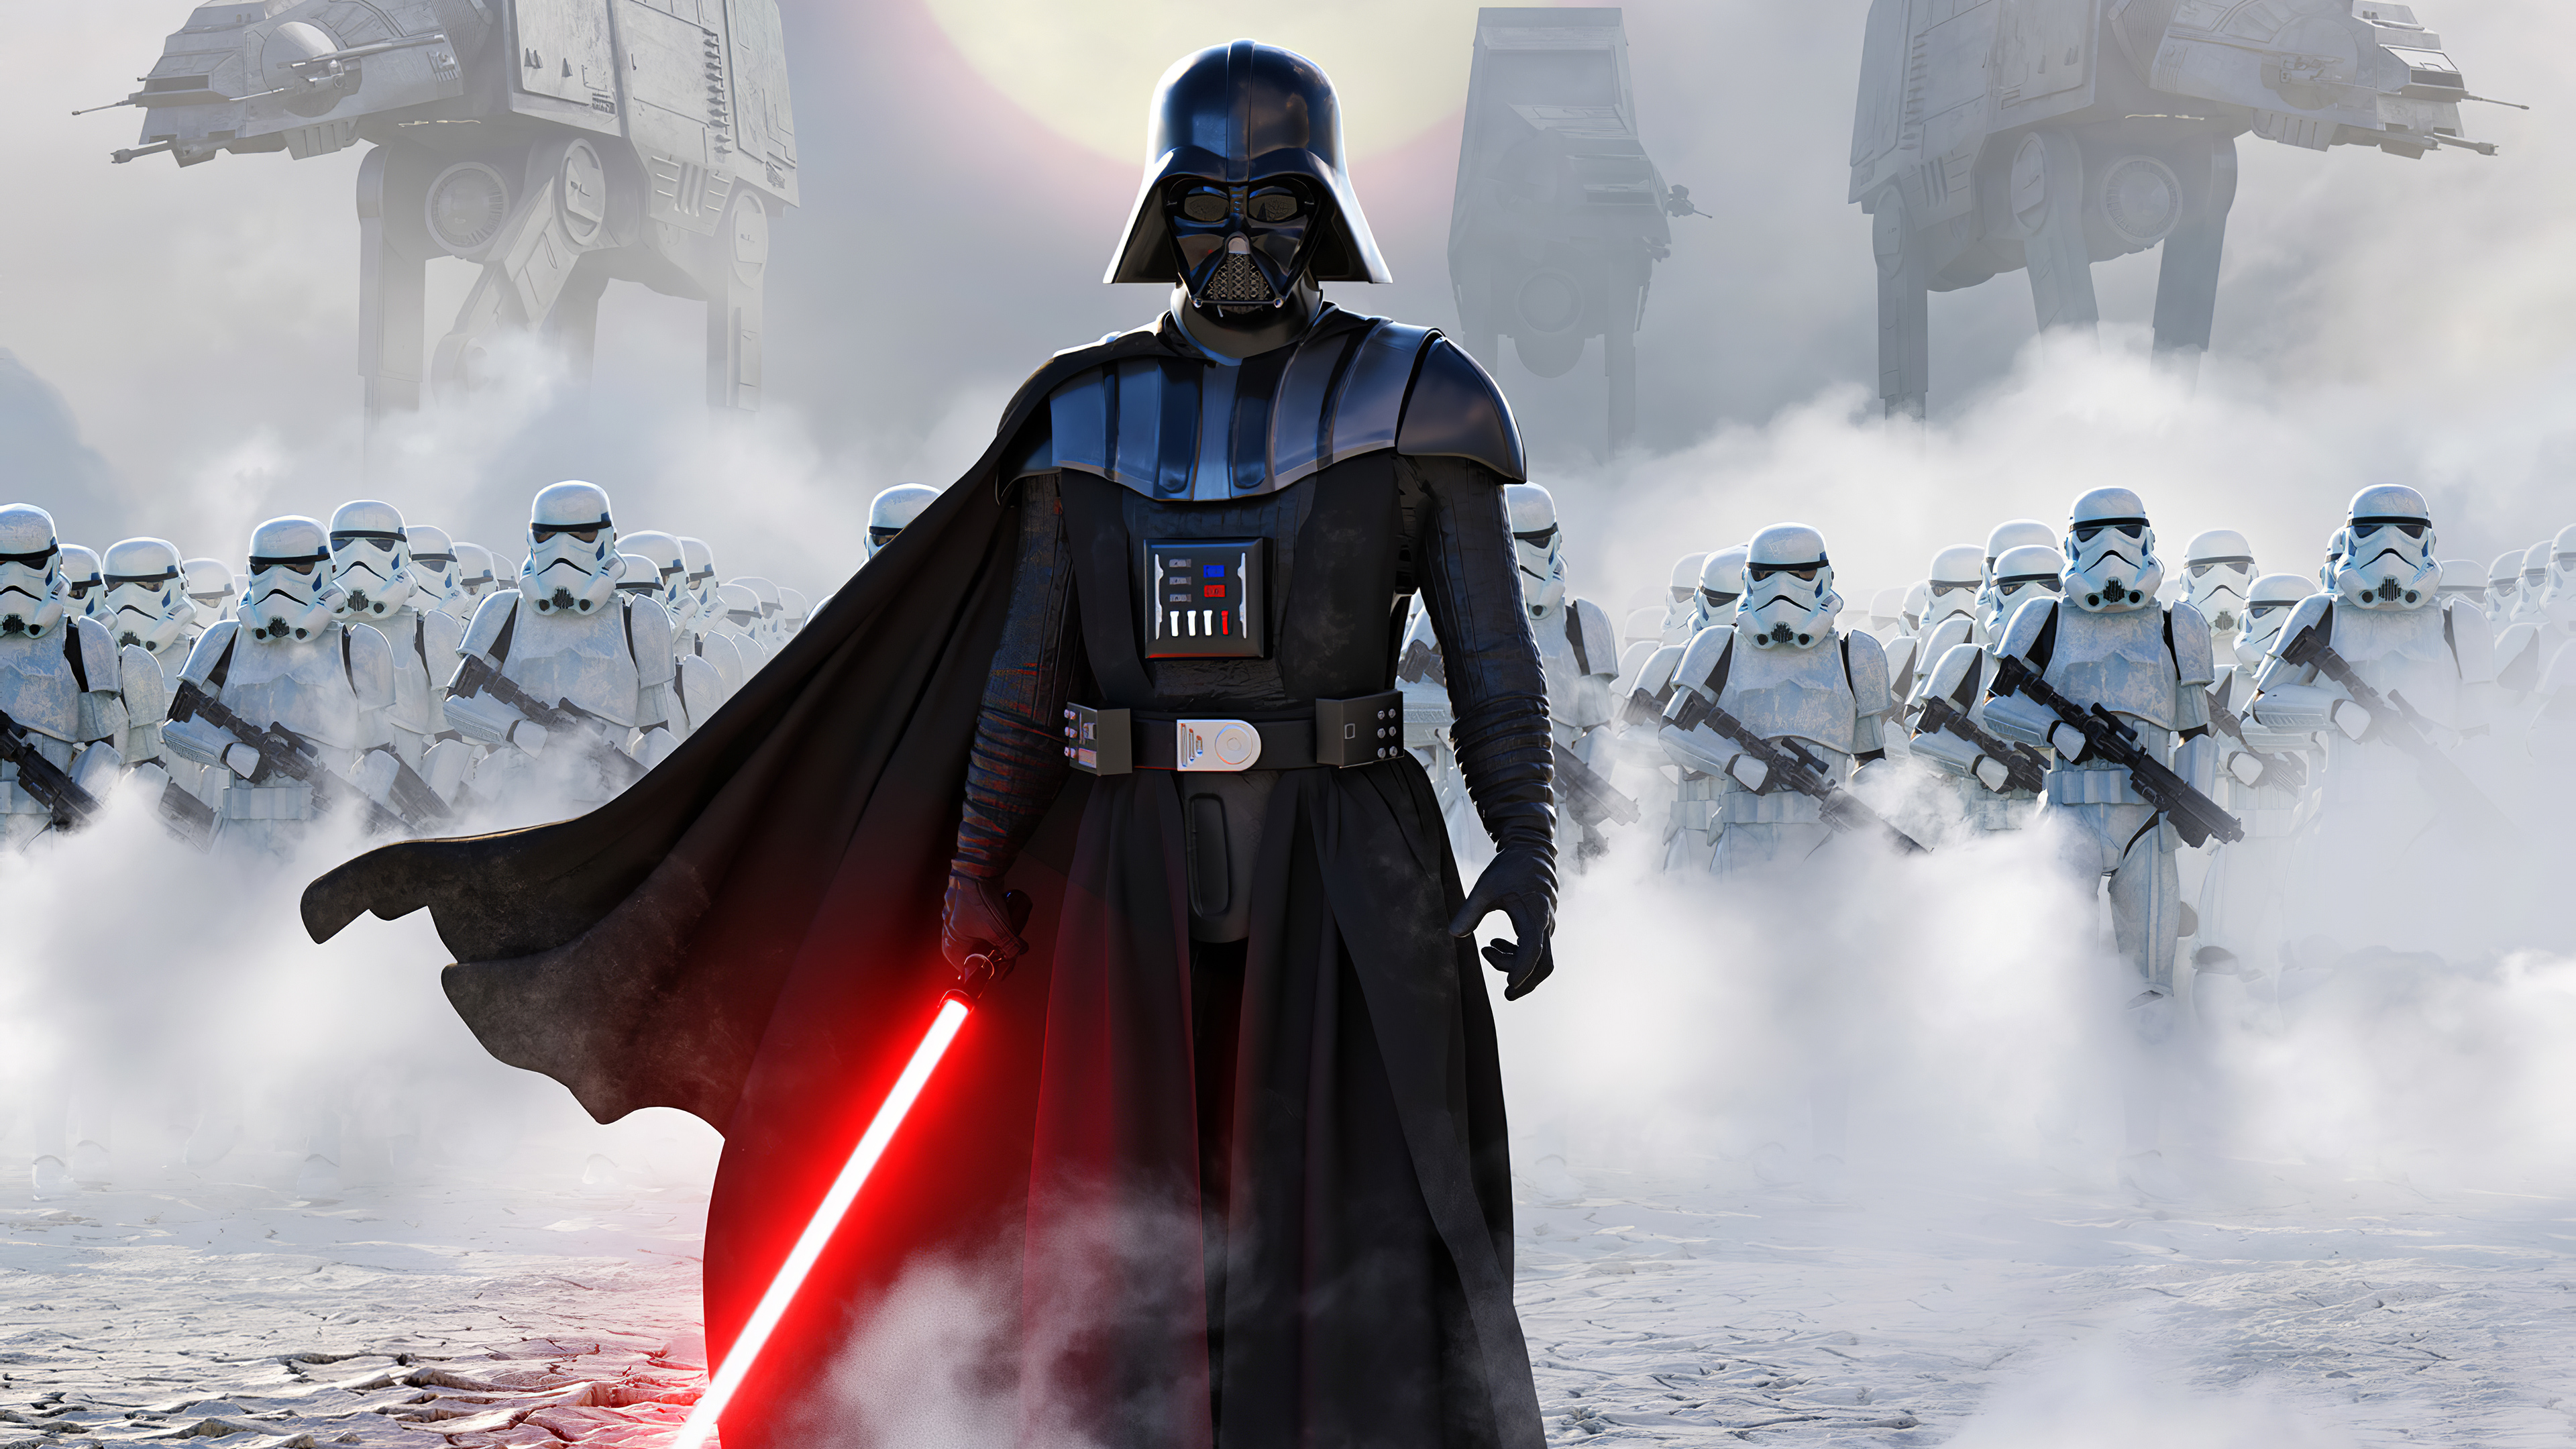 Star Wars 4k Ultra Hd Wallpaper Background Image 3840x2160 Id 1060019 Wallpaper Abyss